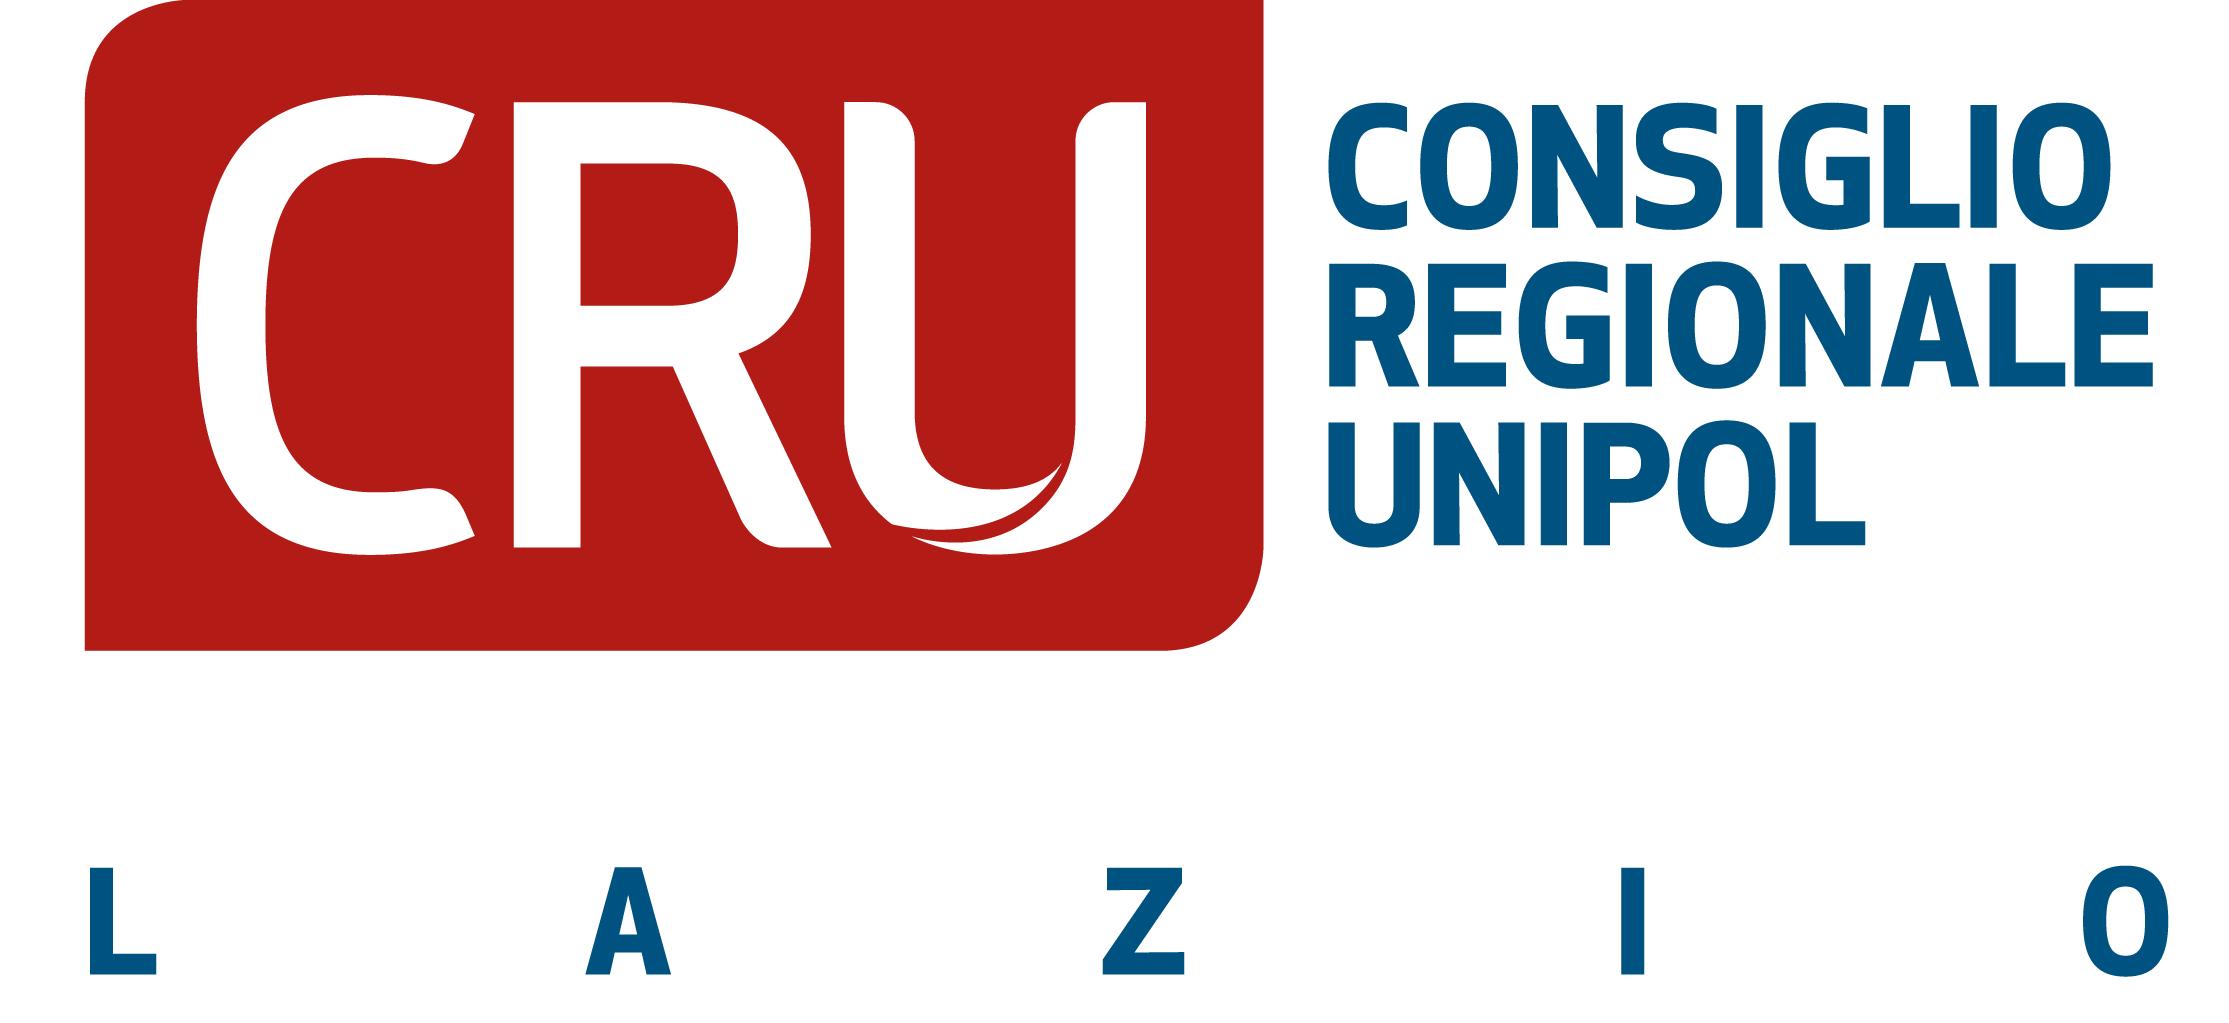 Consiglio Regionale Unipol Lazio